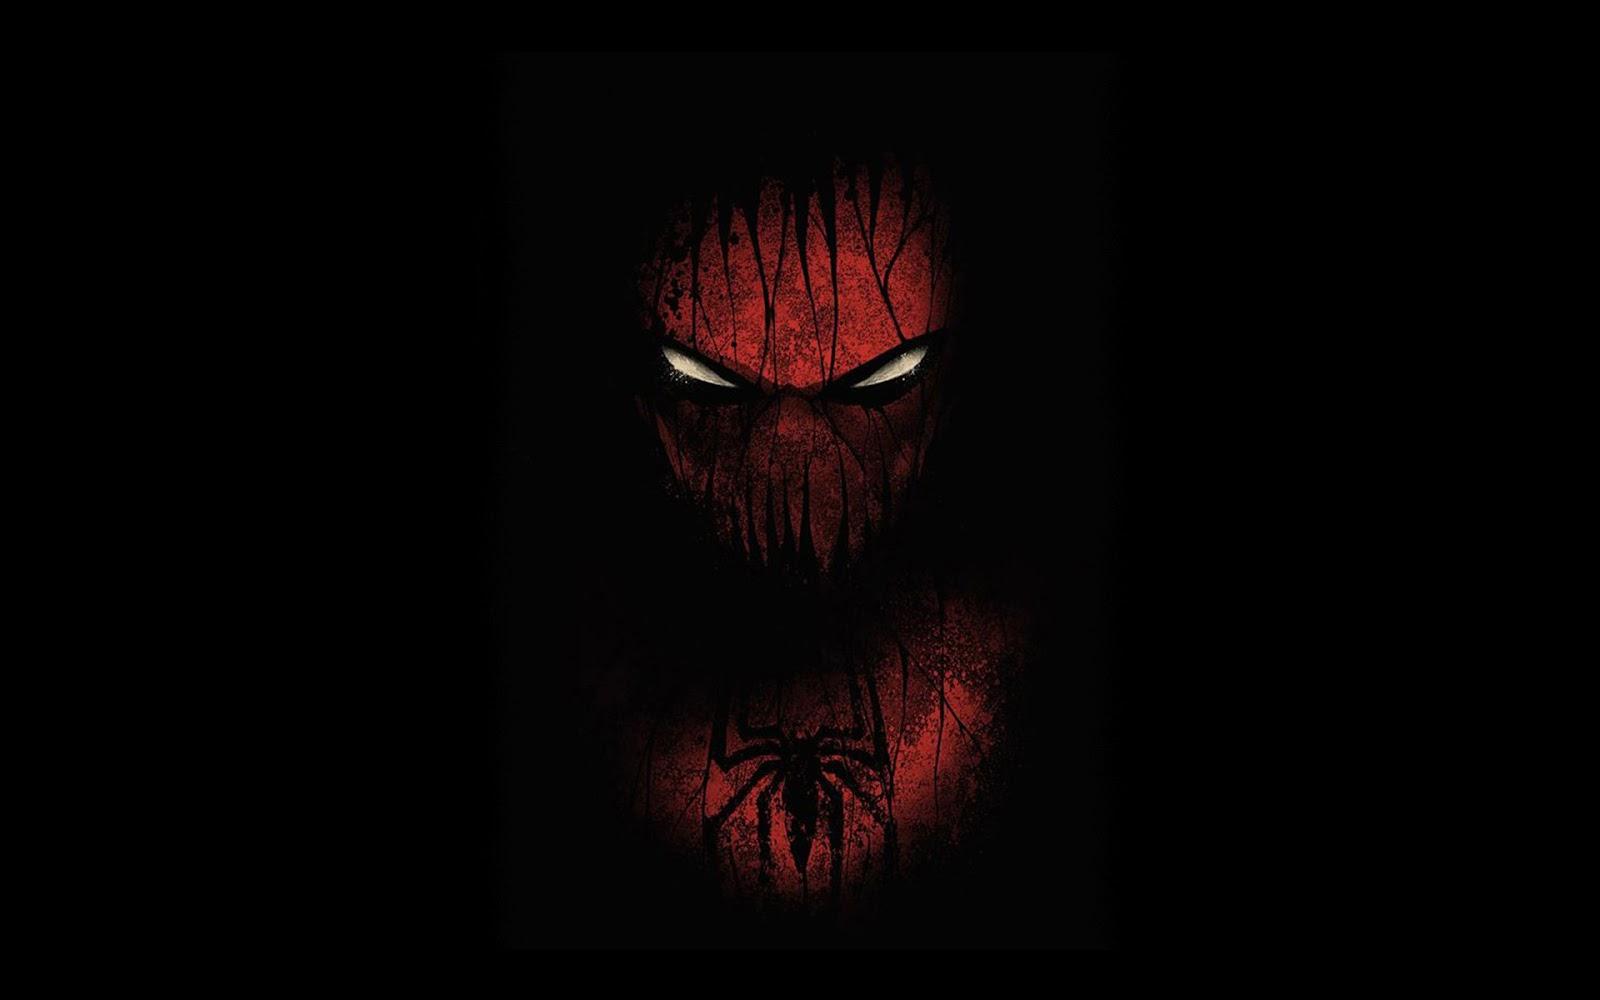 Hd wallpaper hero - Superhero Black Dark Background Hd Wallpaper Desktop Pc Background